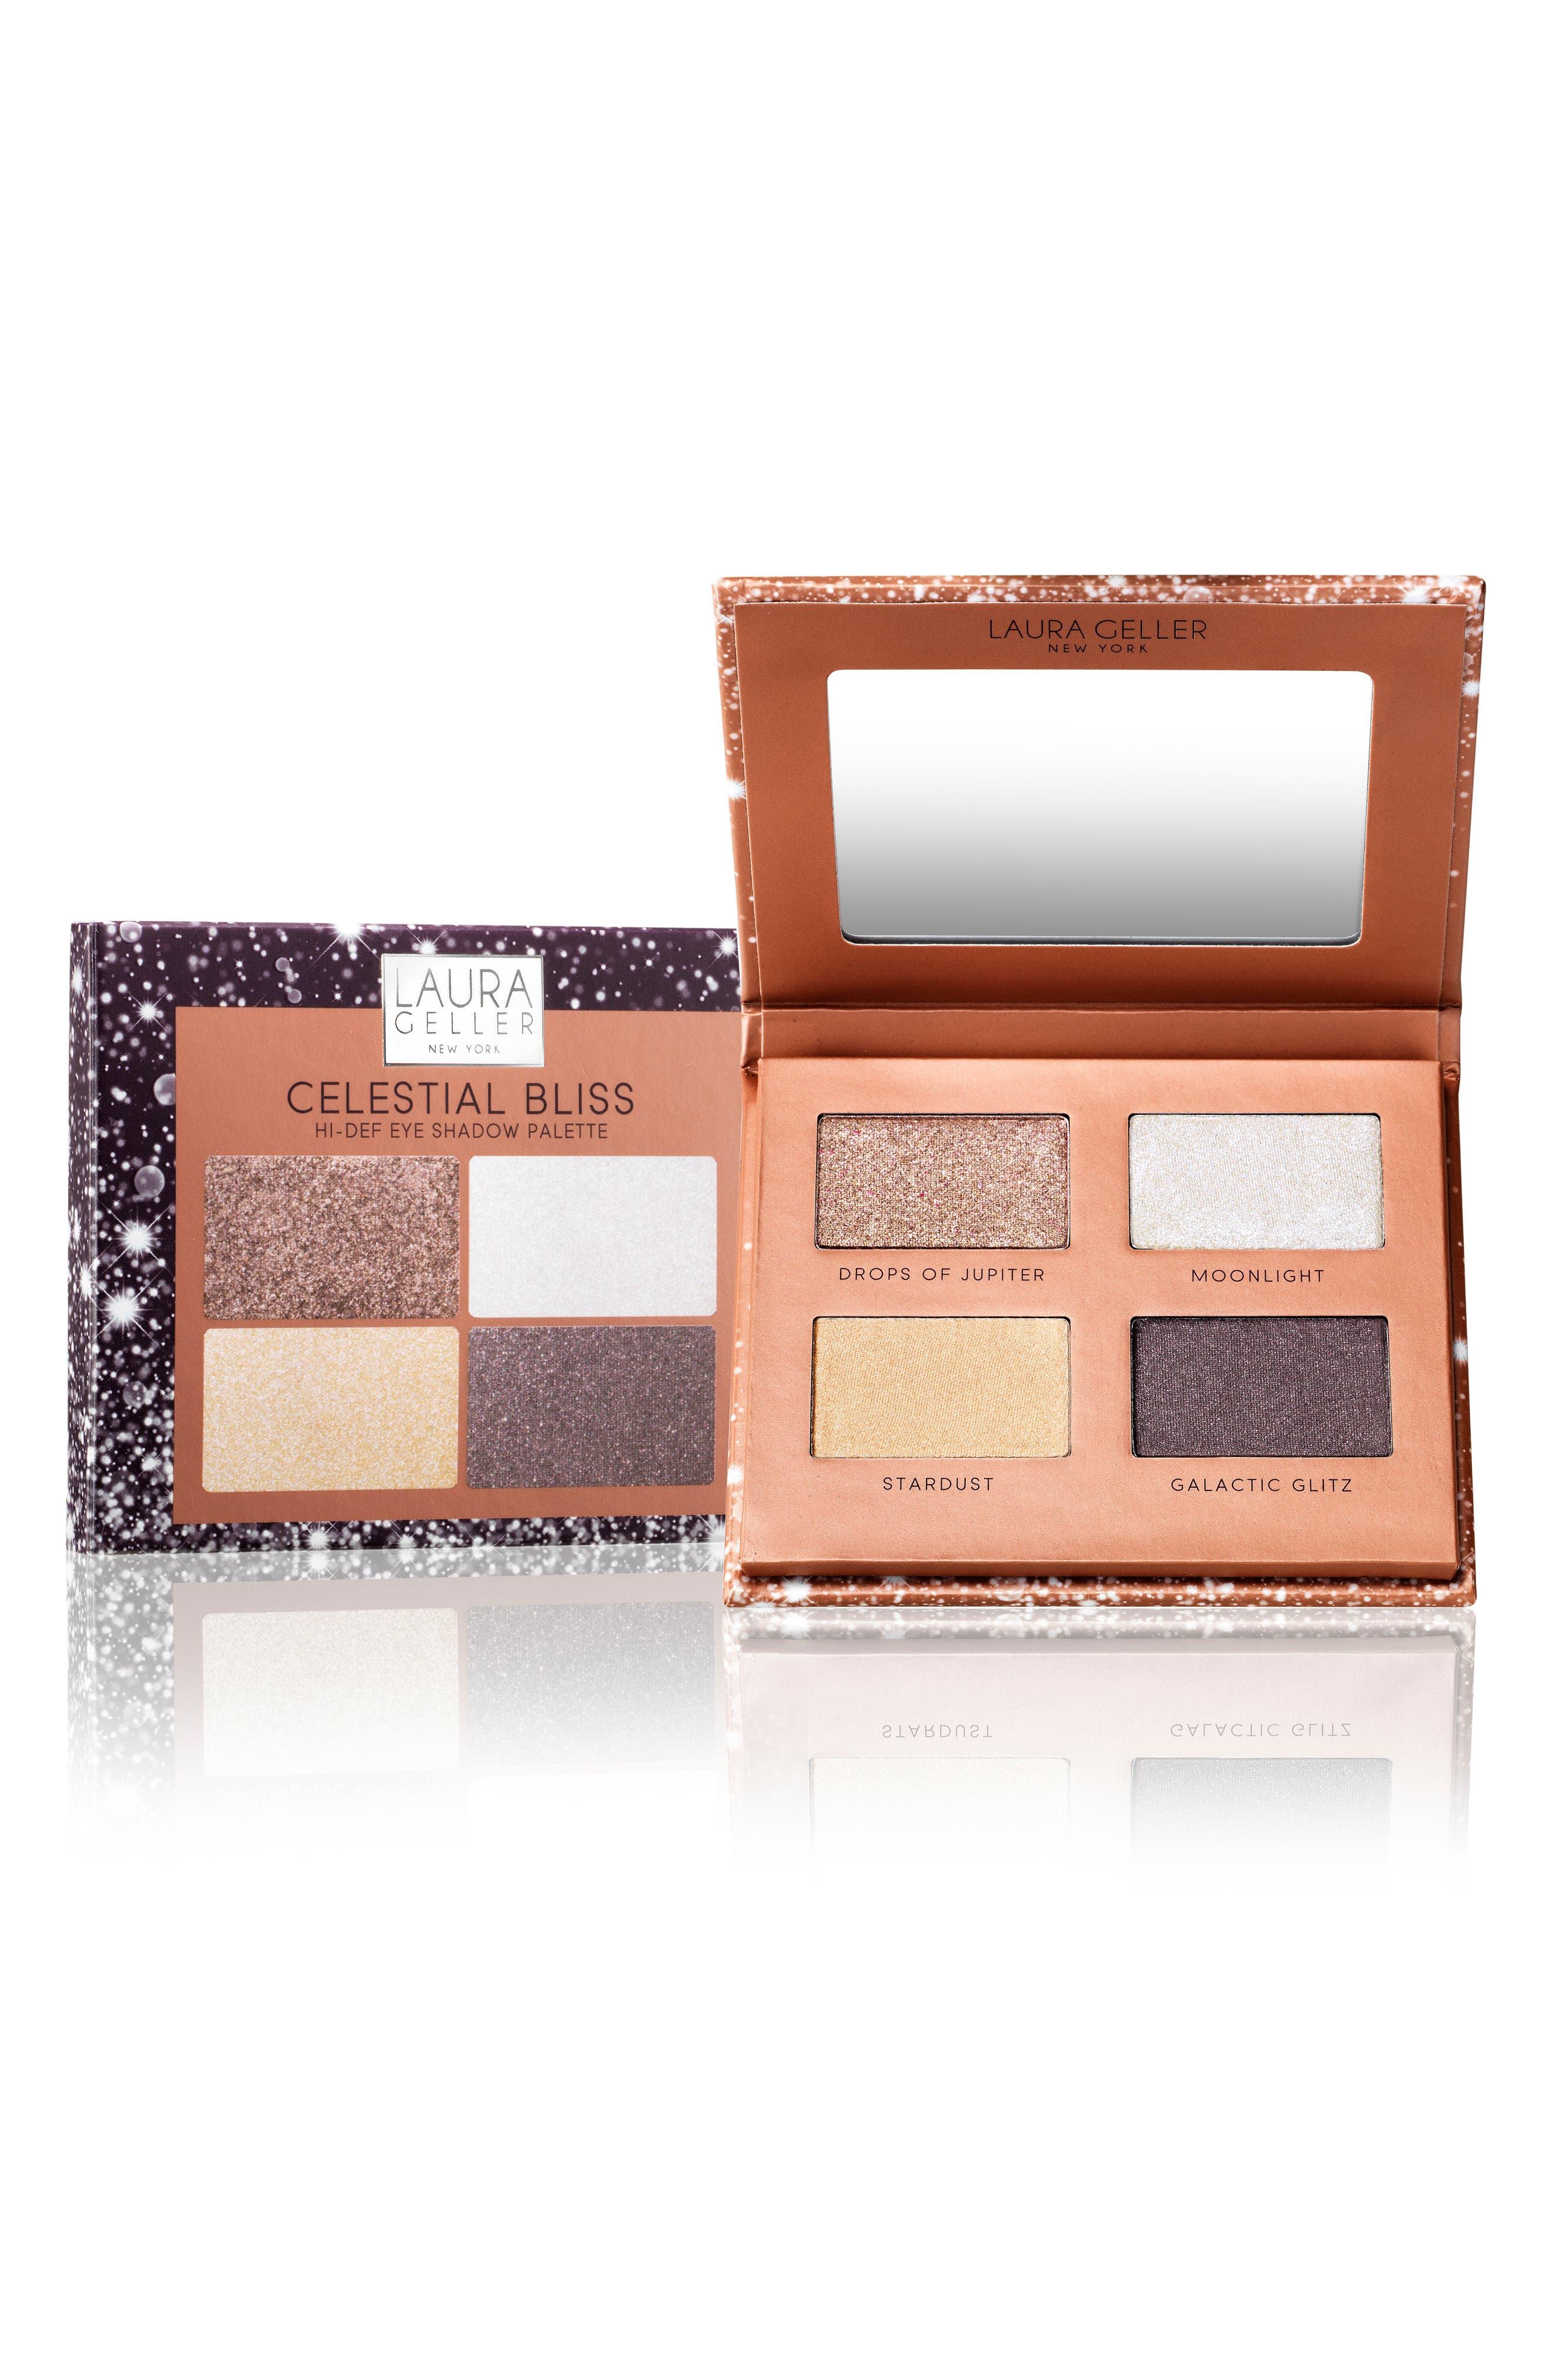 Laura Geller Beauty Celestial Bliss Hi-Def Eyeshadow Palette (Limited Edition)